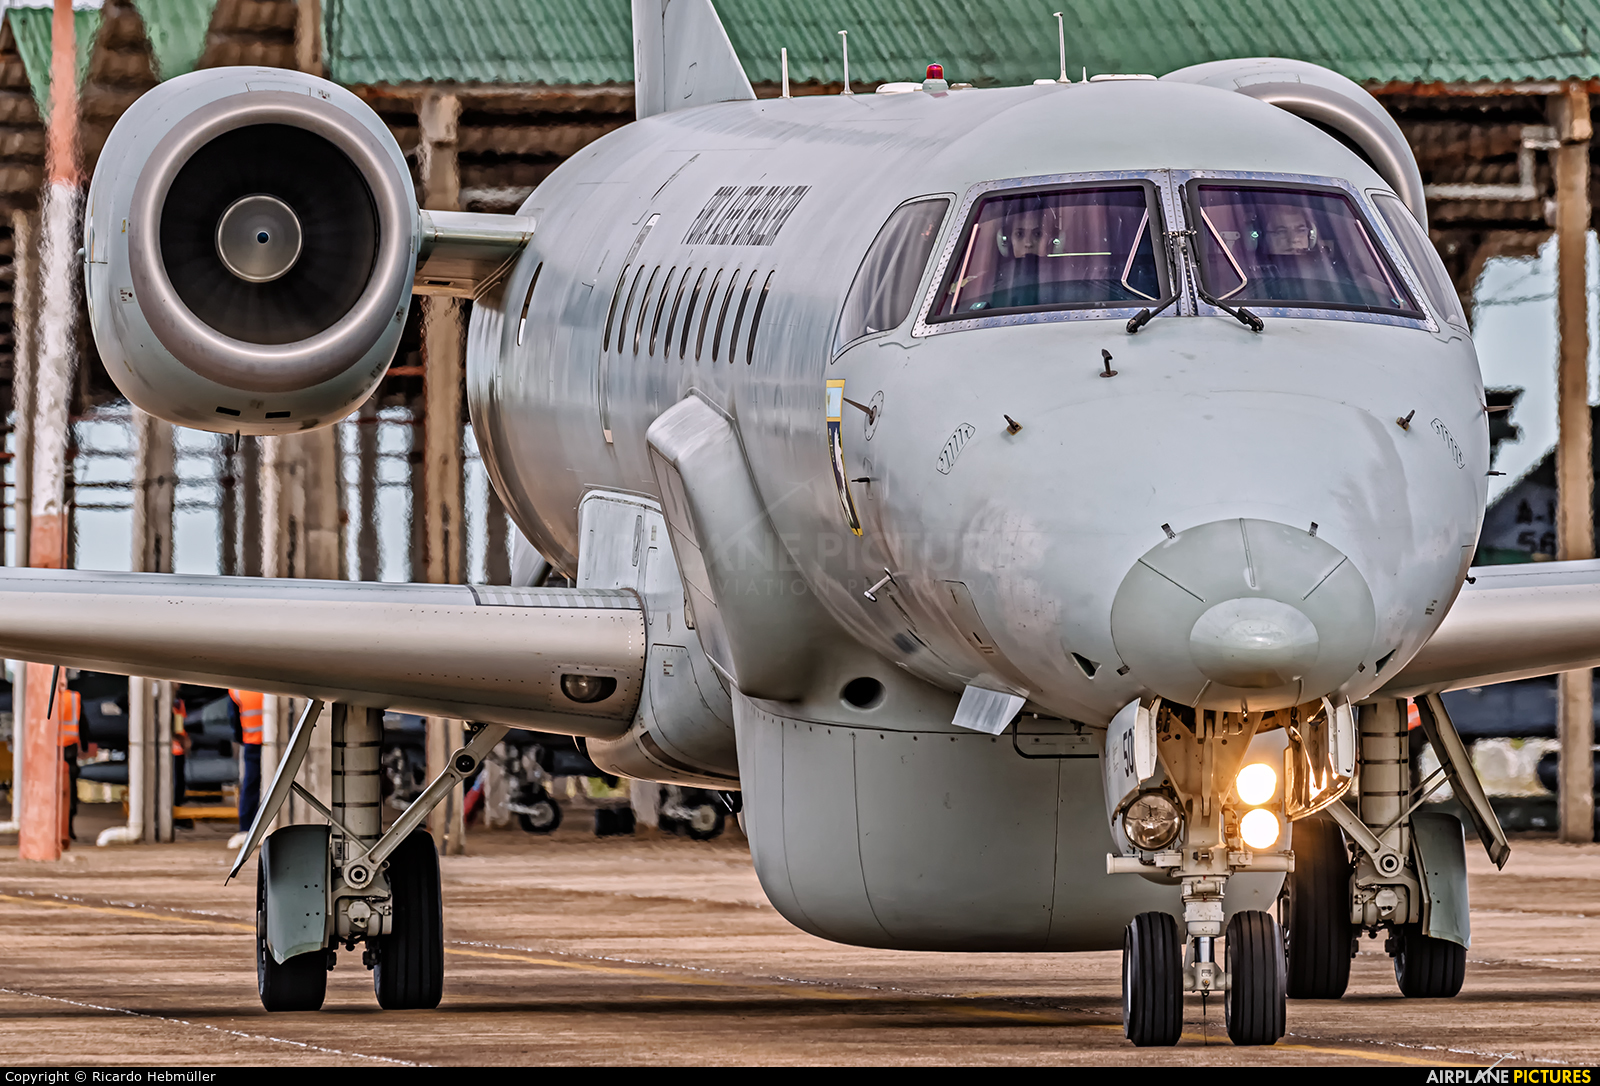 Brazil - Air Force 6750 aircraft at Campo Grande